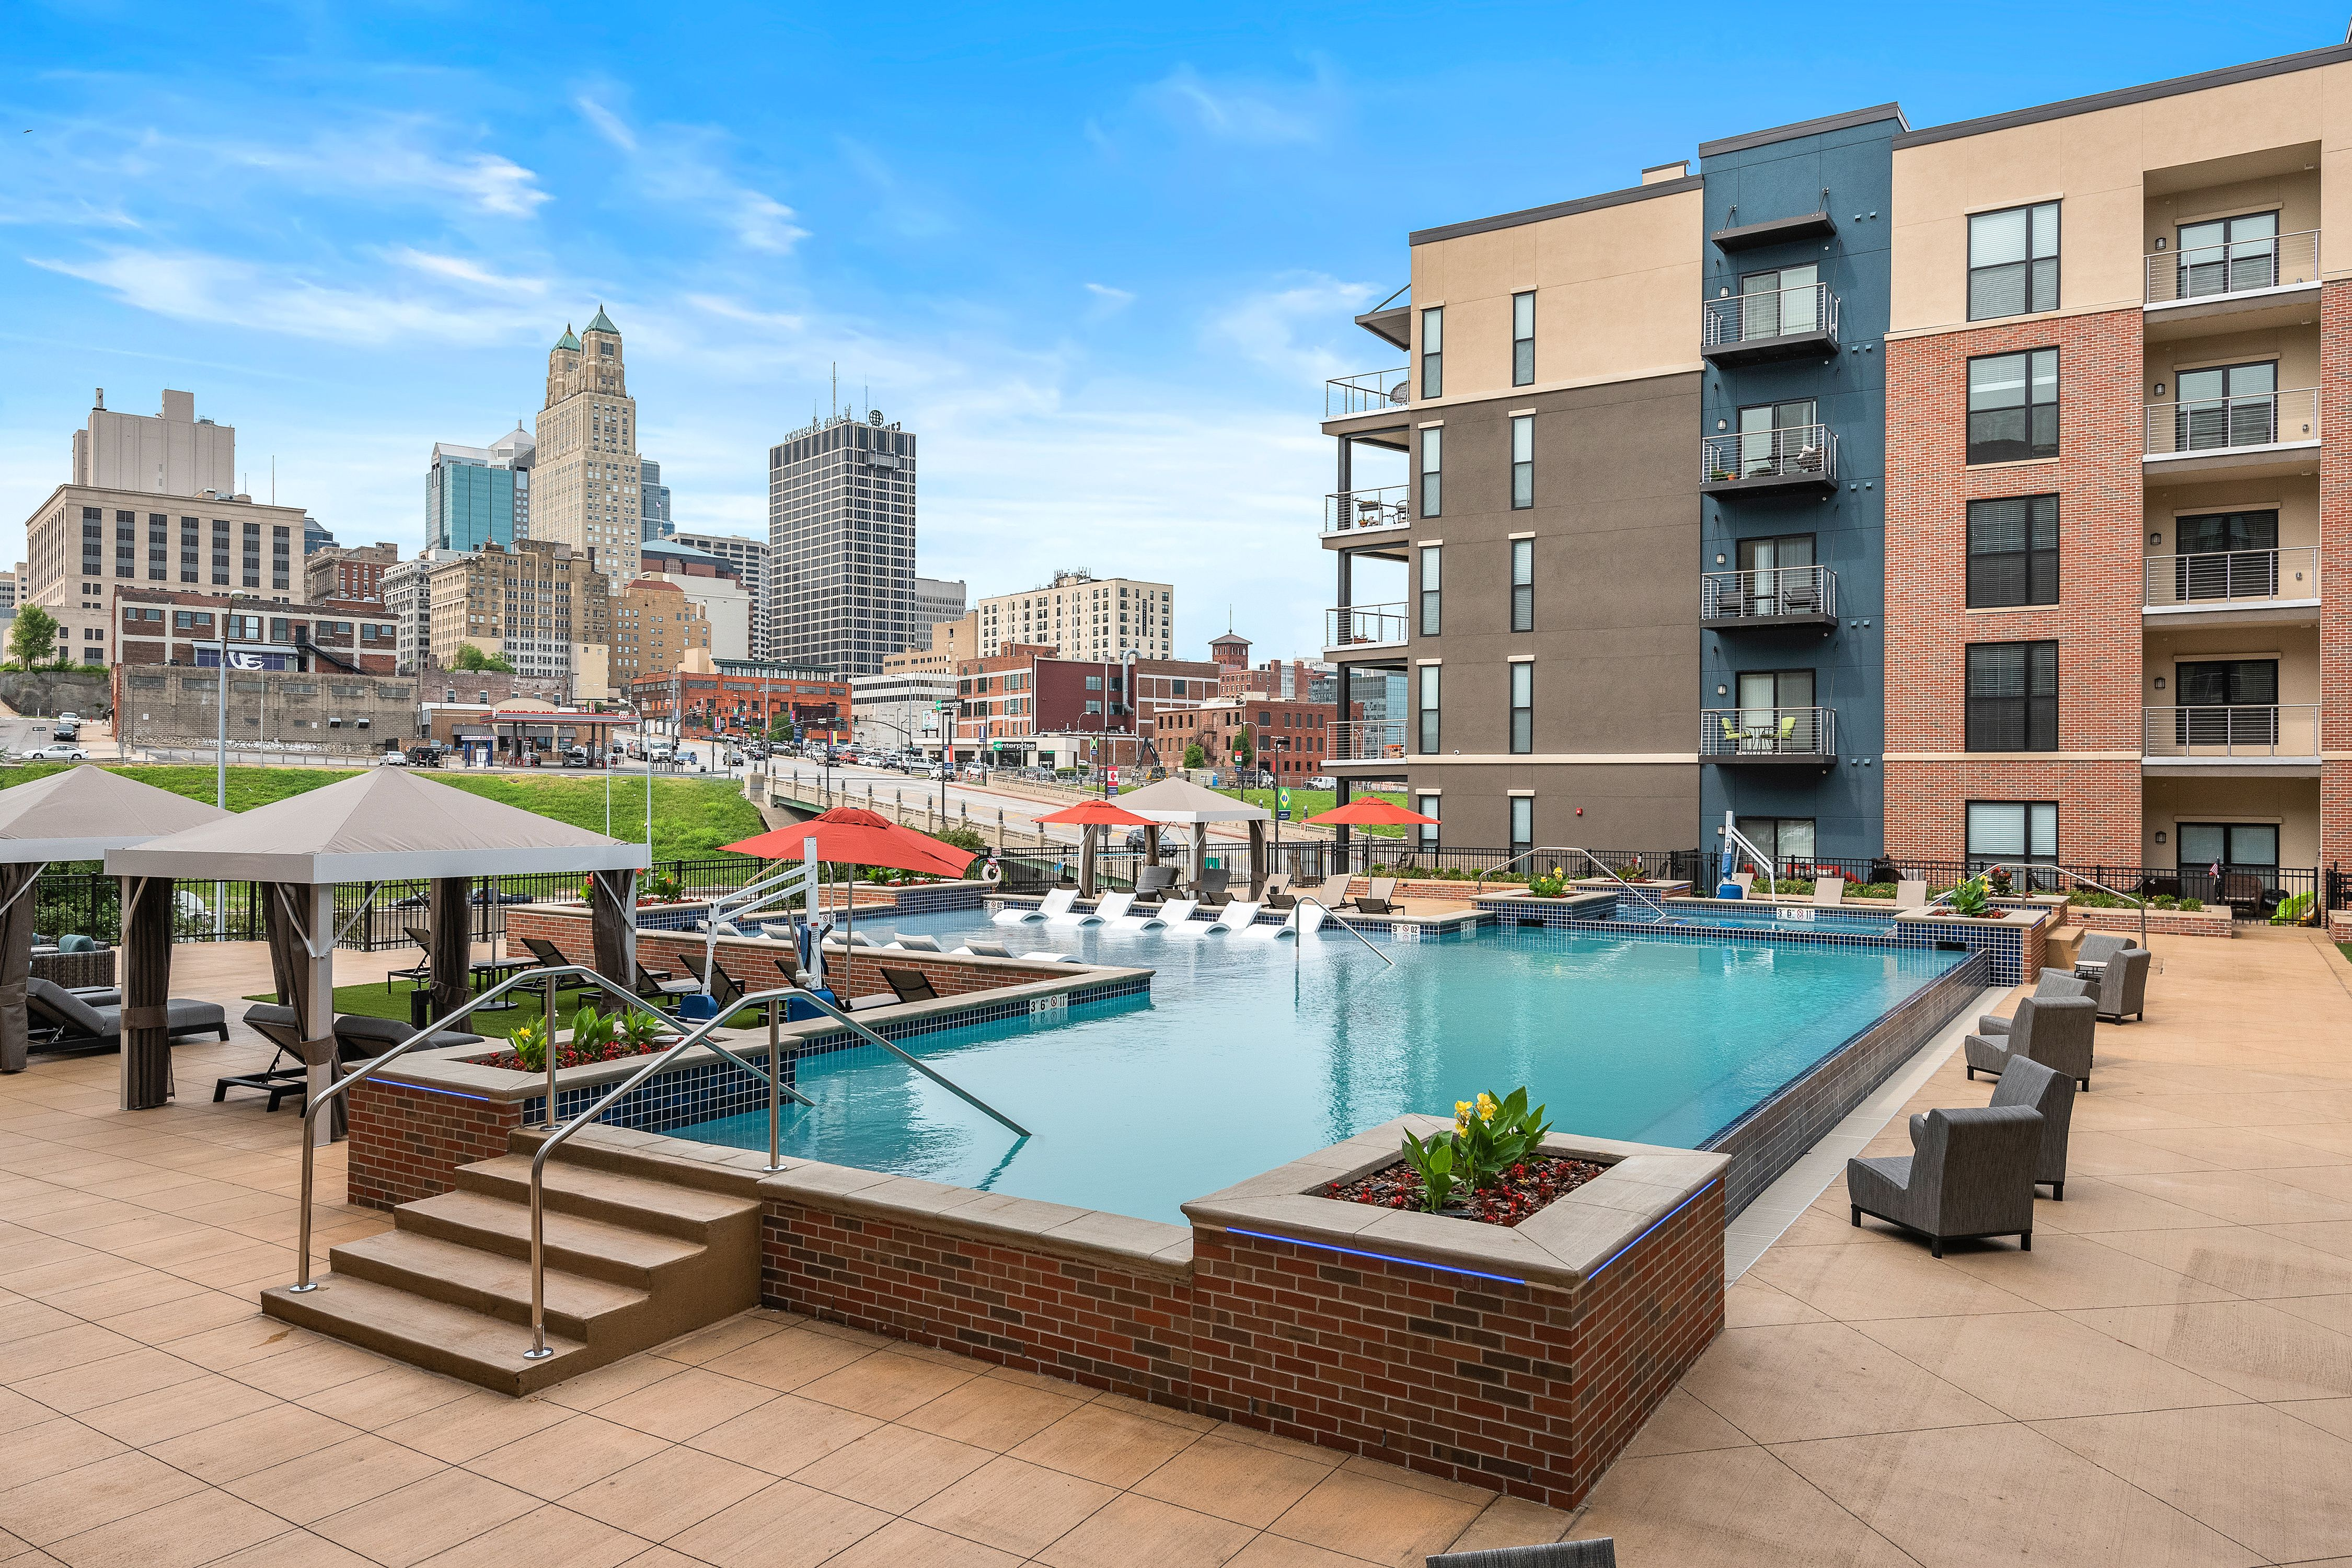 531 Grand Amenities Nspjarchitects Kansascity Kcmo Multifamily Luxuryapartments Apartments P Kansas City Apartments Luxury Apartment Pool Apartment Pool